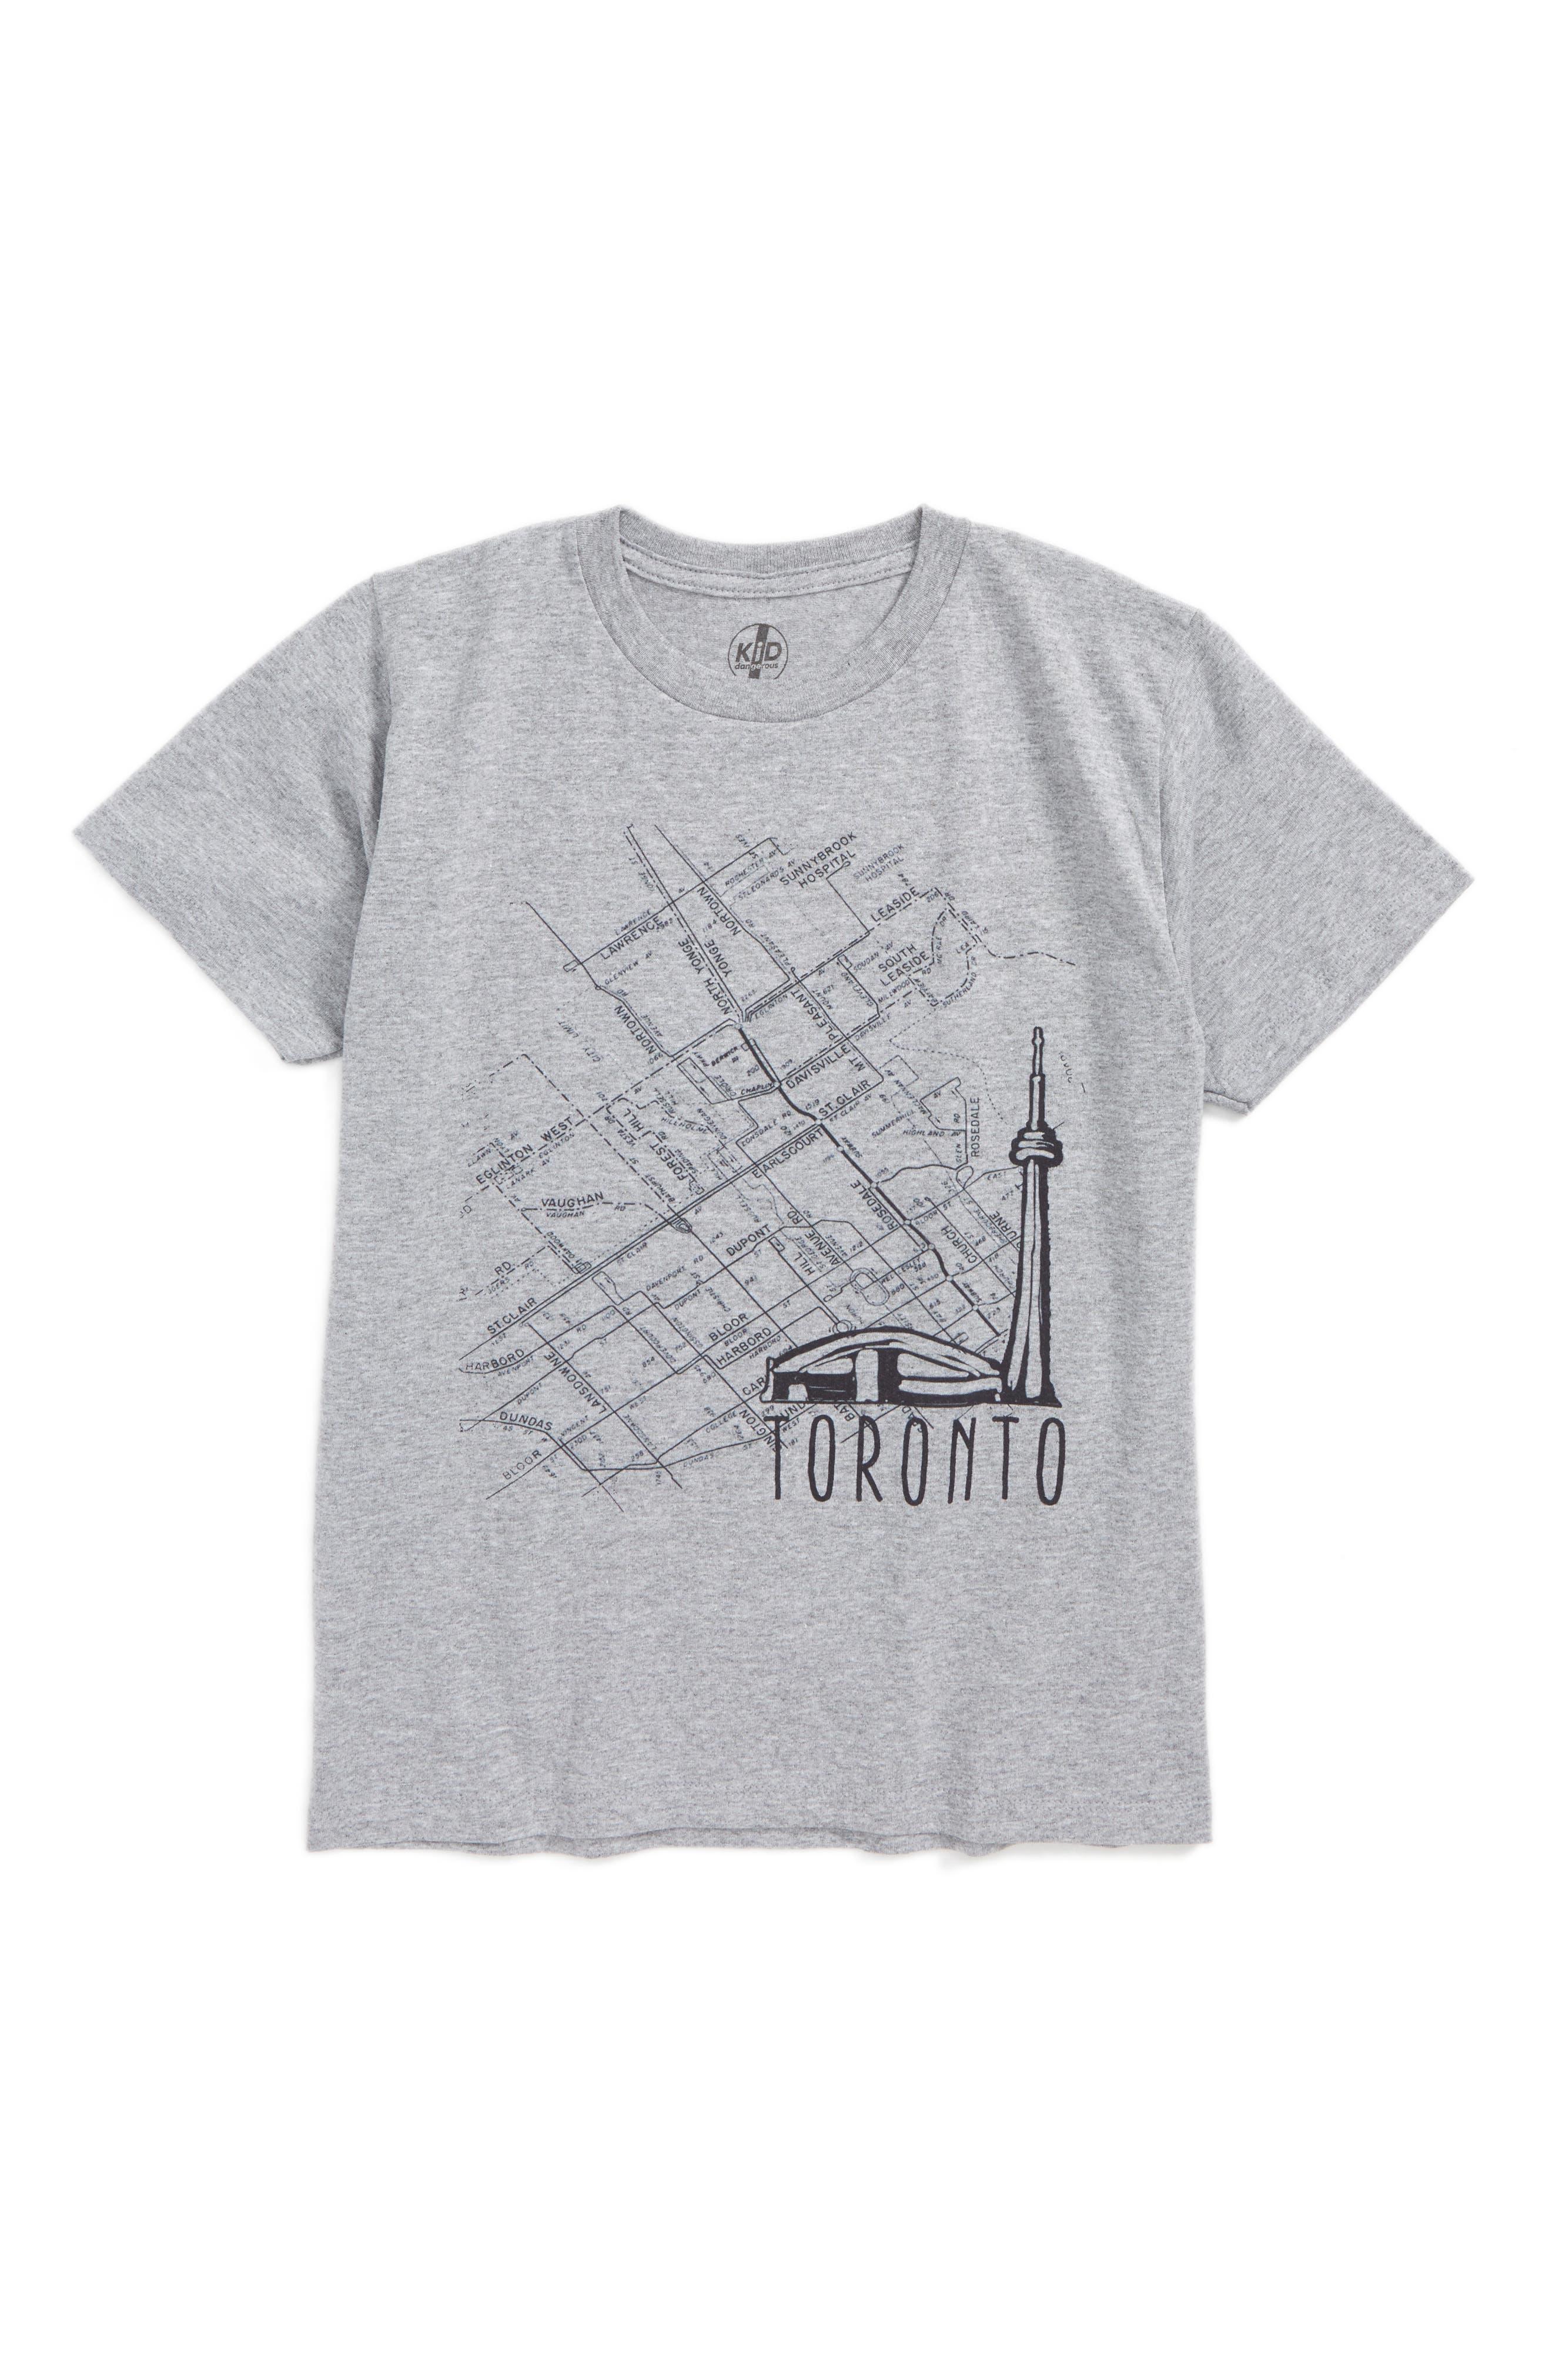 Kid Dangerous Toronto Map Graphic T-Shirt (Big Boys)